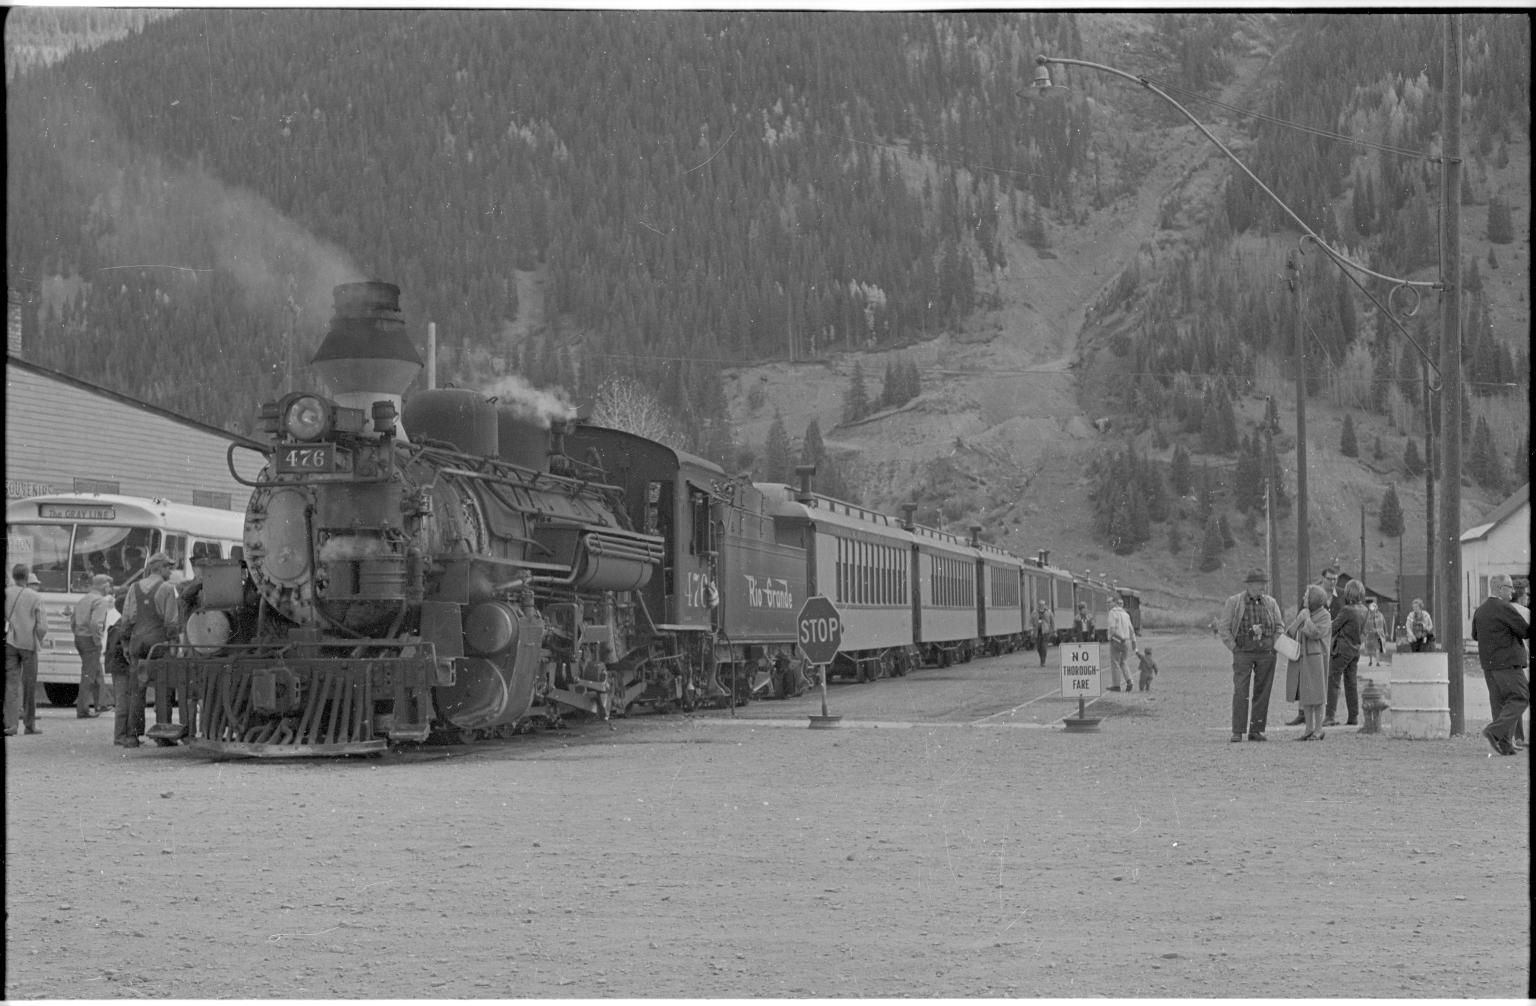 Silverton and Durango Narrow Gauge Railroad